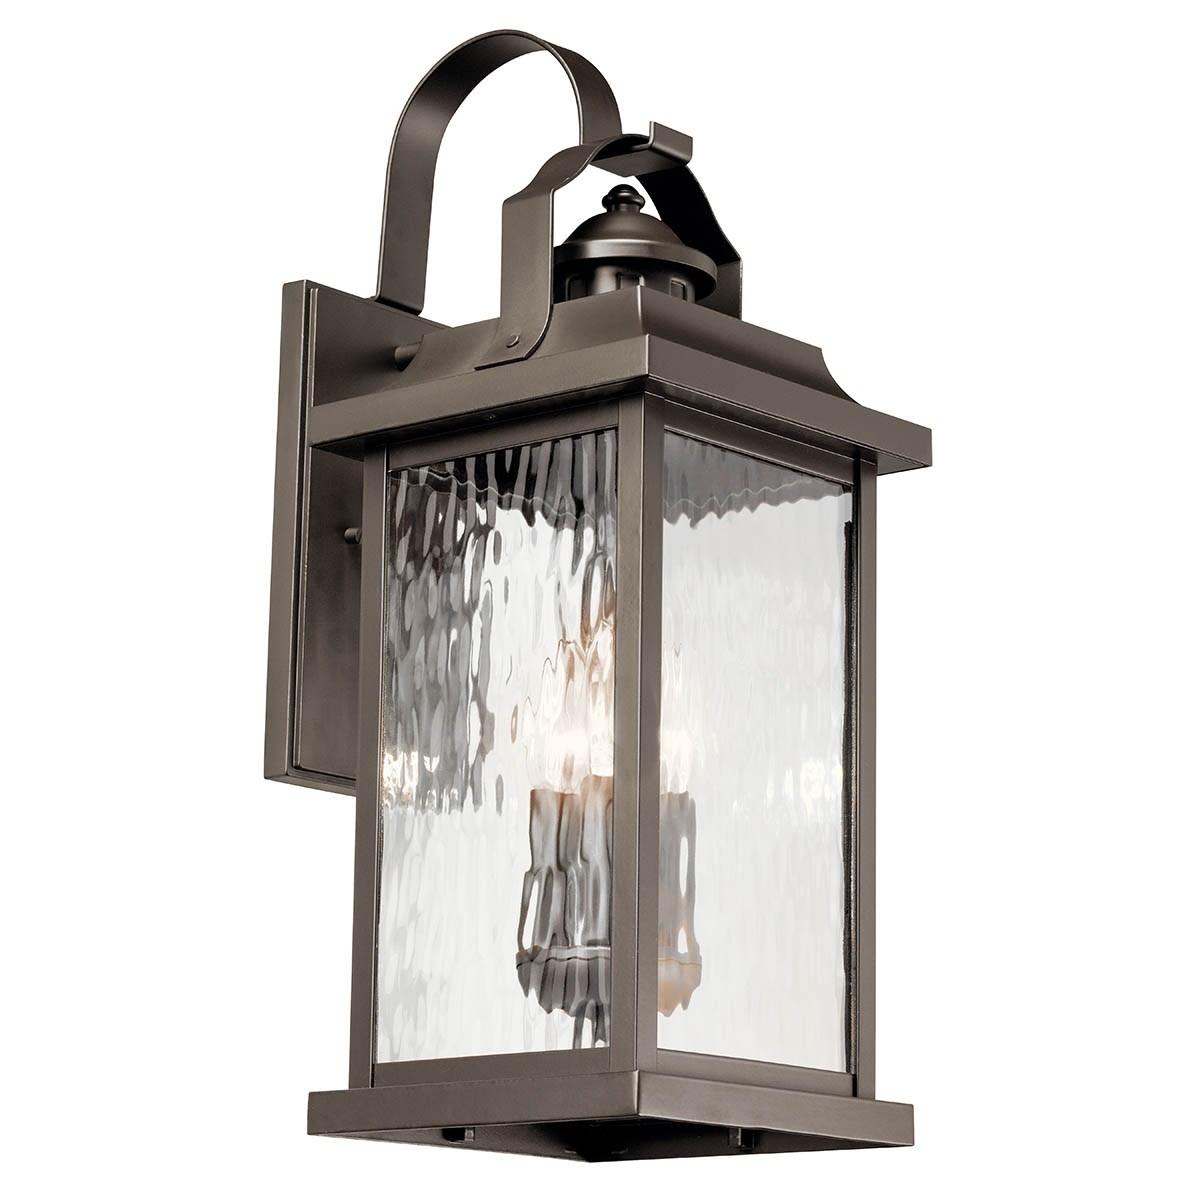 "Www Kichler: Linford 22.25"" 3 Light Wall Light Olde Bronze®"